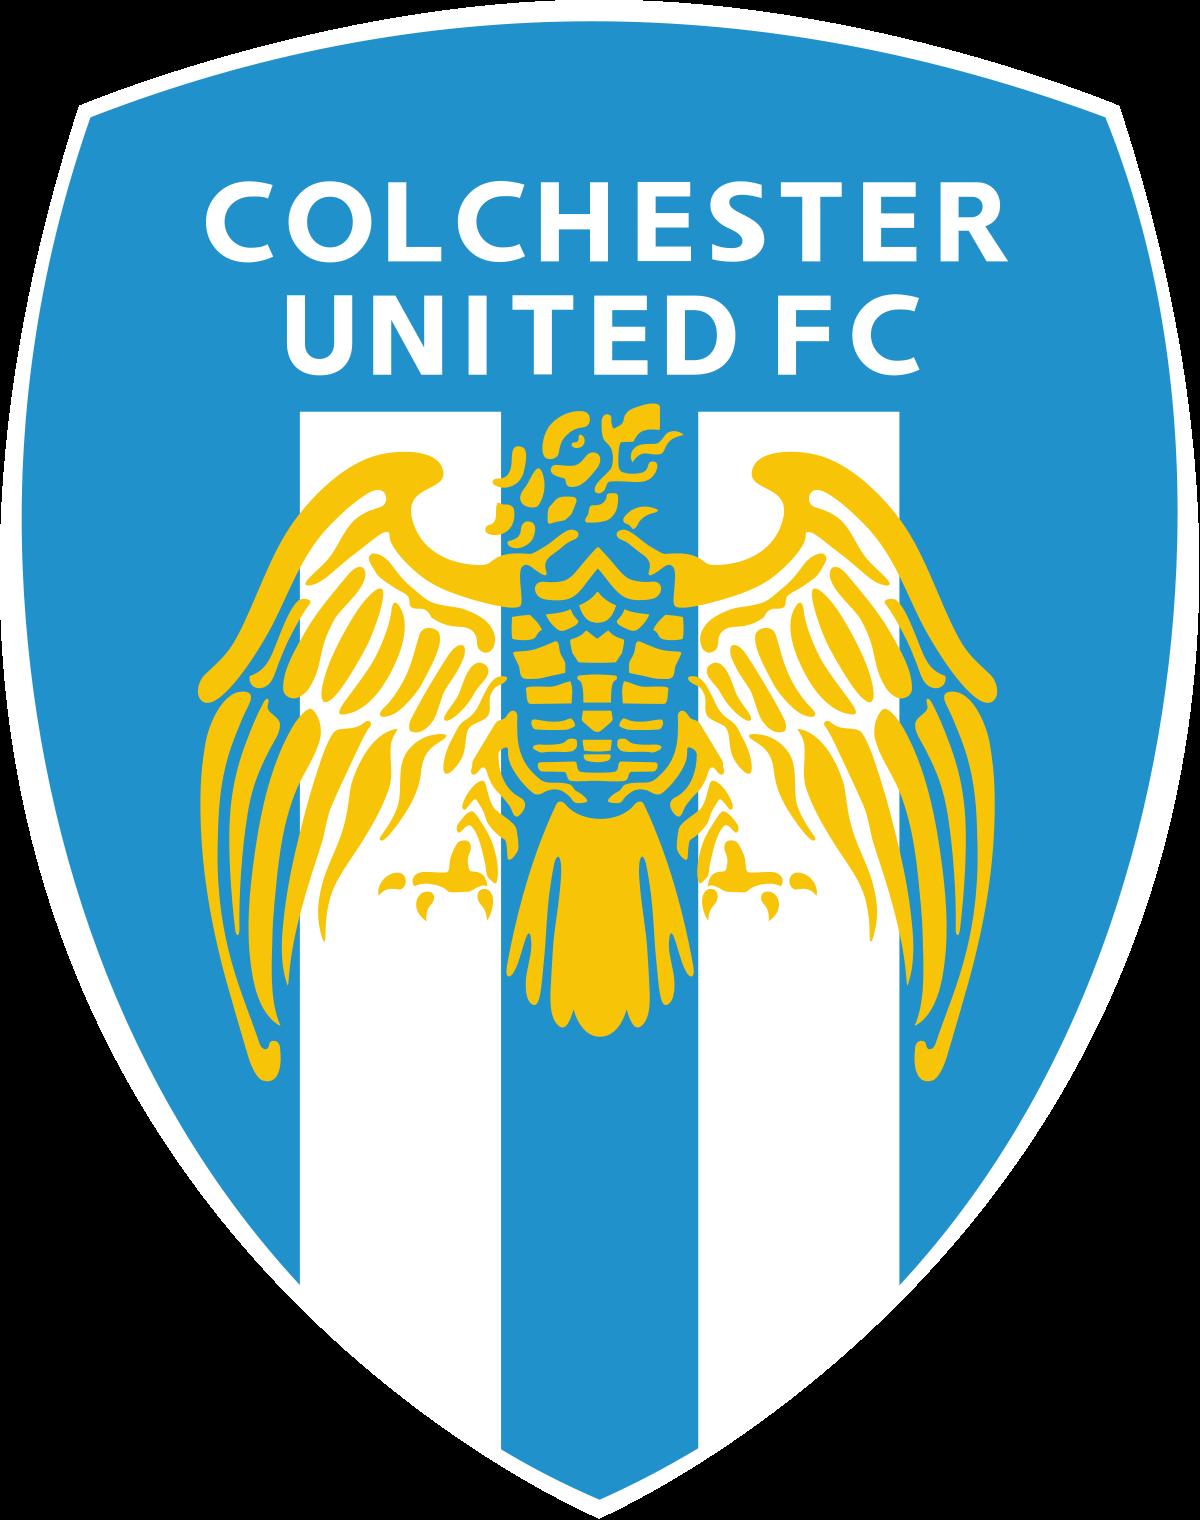 Лого Колчестер Юнайтед - Stone Forest